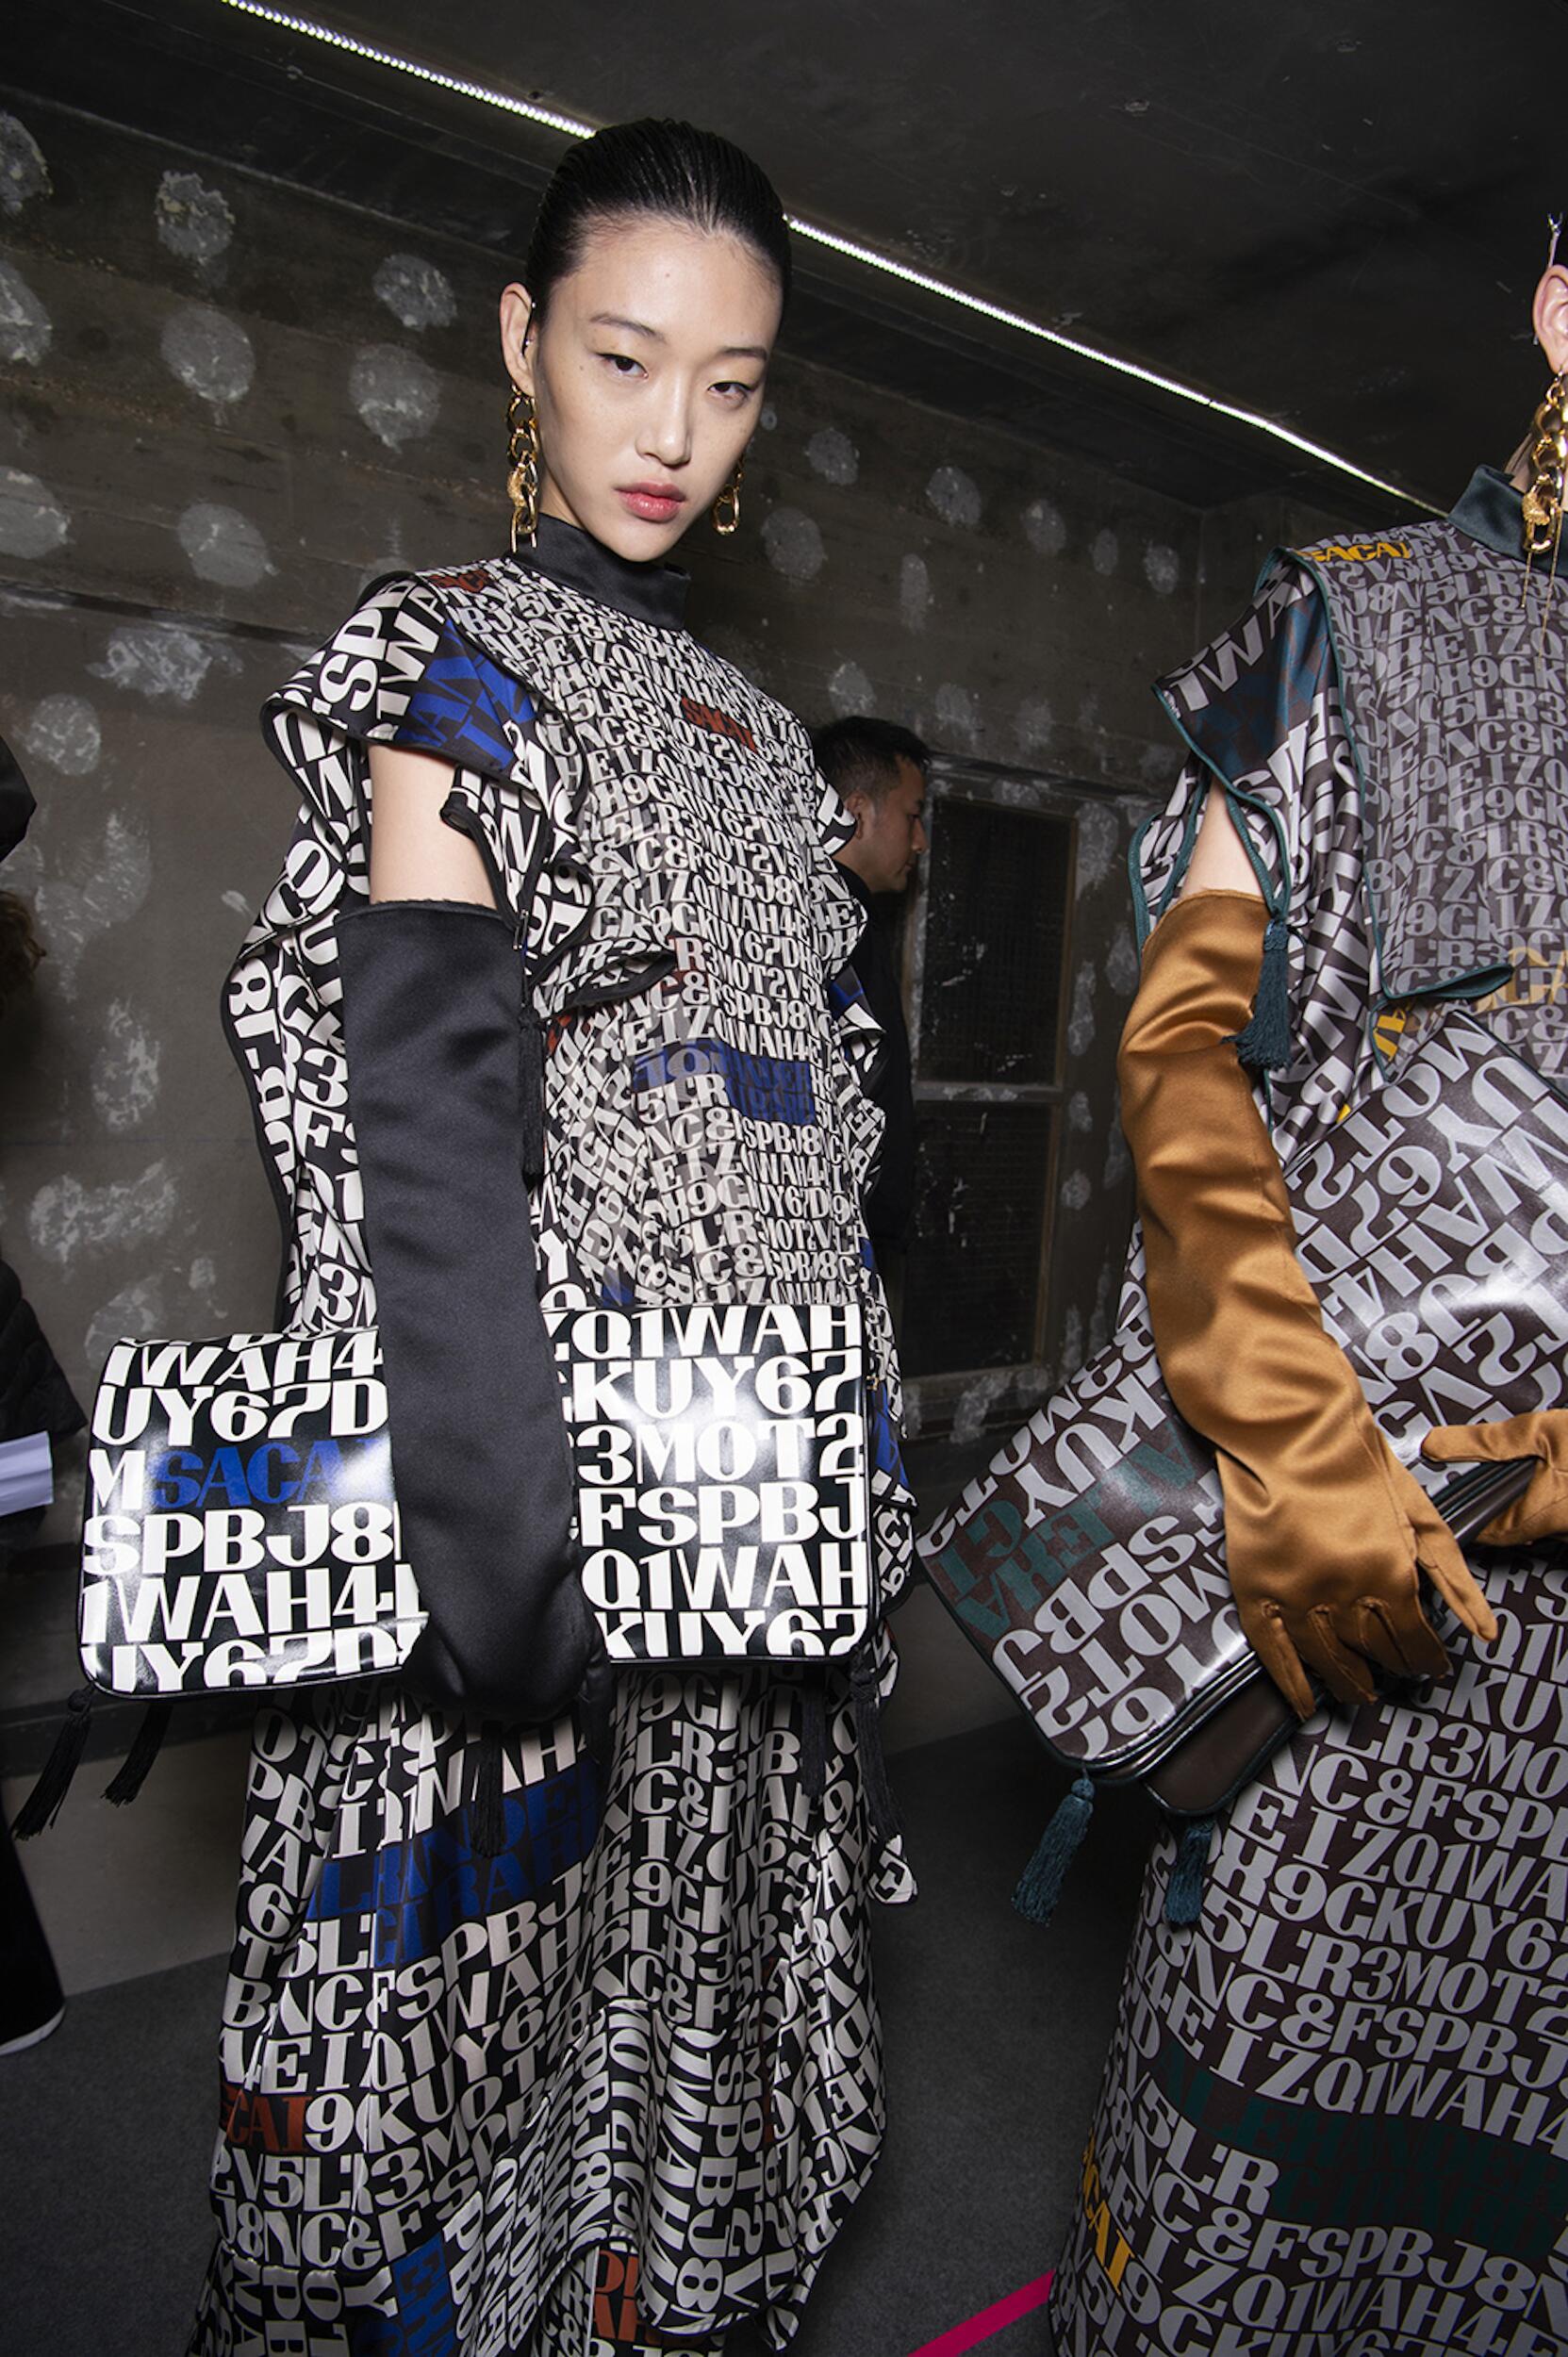 Backstage Sacai Fashion Trends 2020 Model